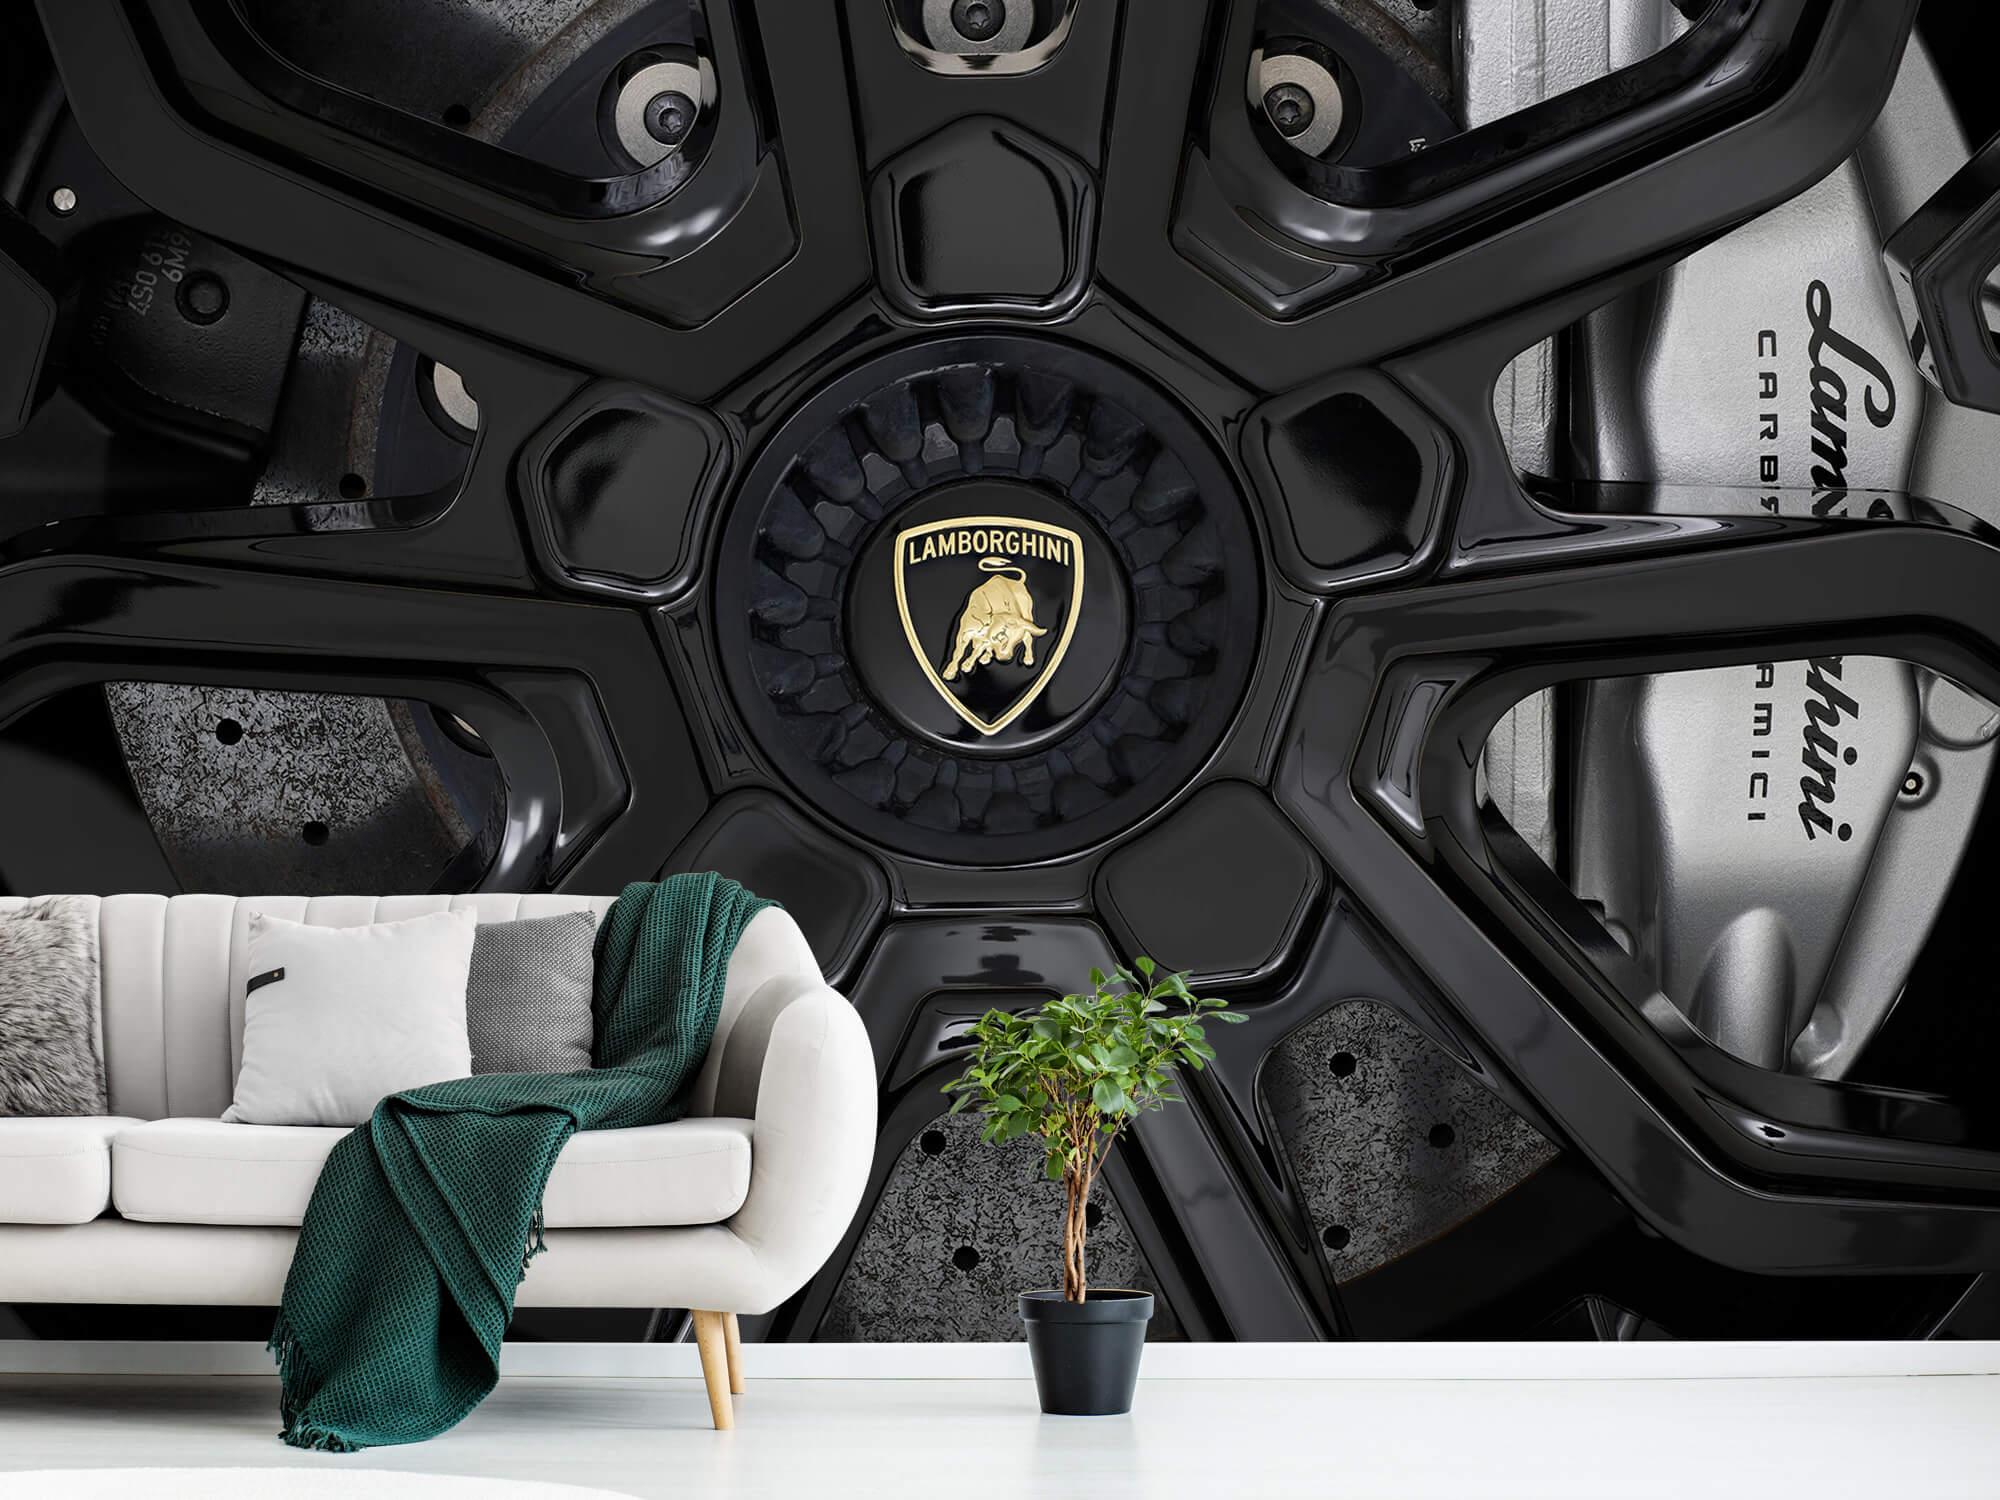 Pattern Lamborghini Huracán - Wheel 1